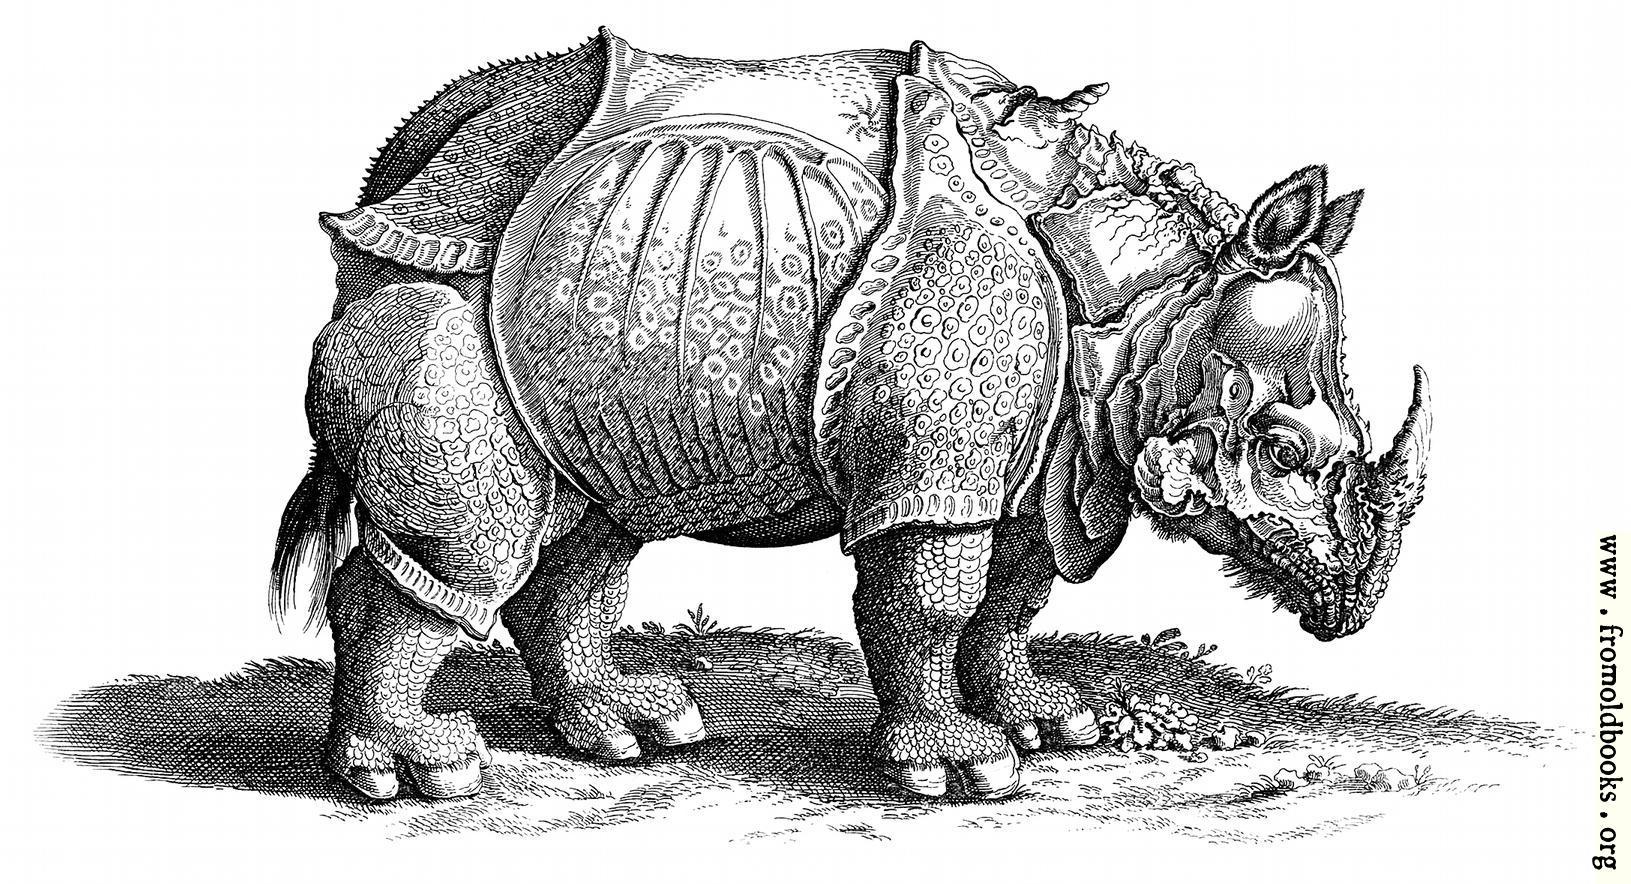 Een Kleurplaat Van Dieren Rhinocerous Hornnase Rhinocer Engraving